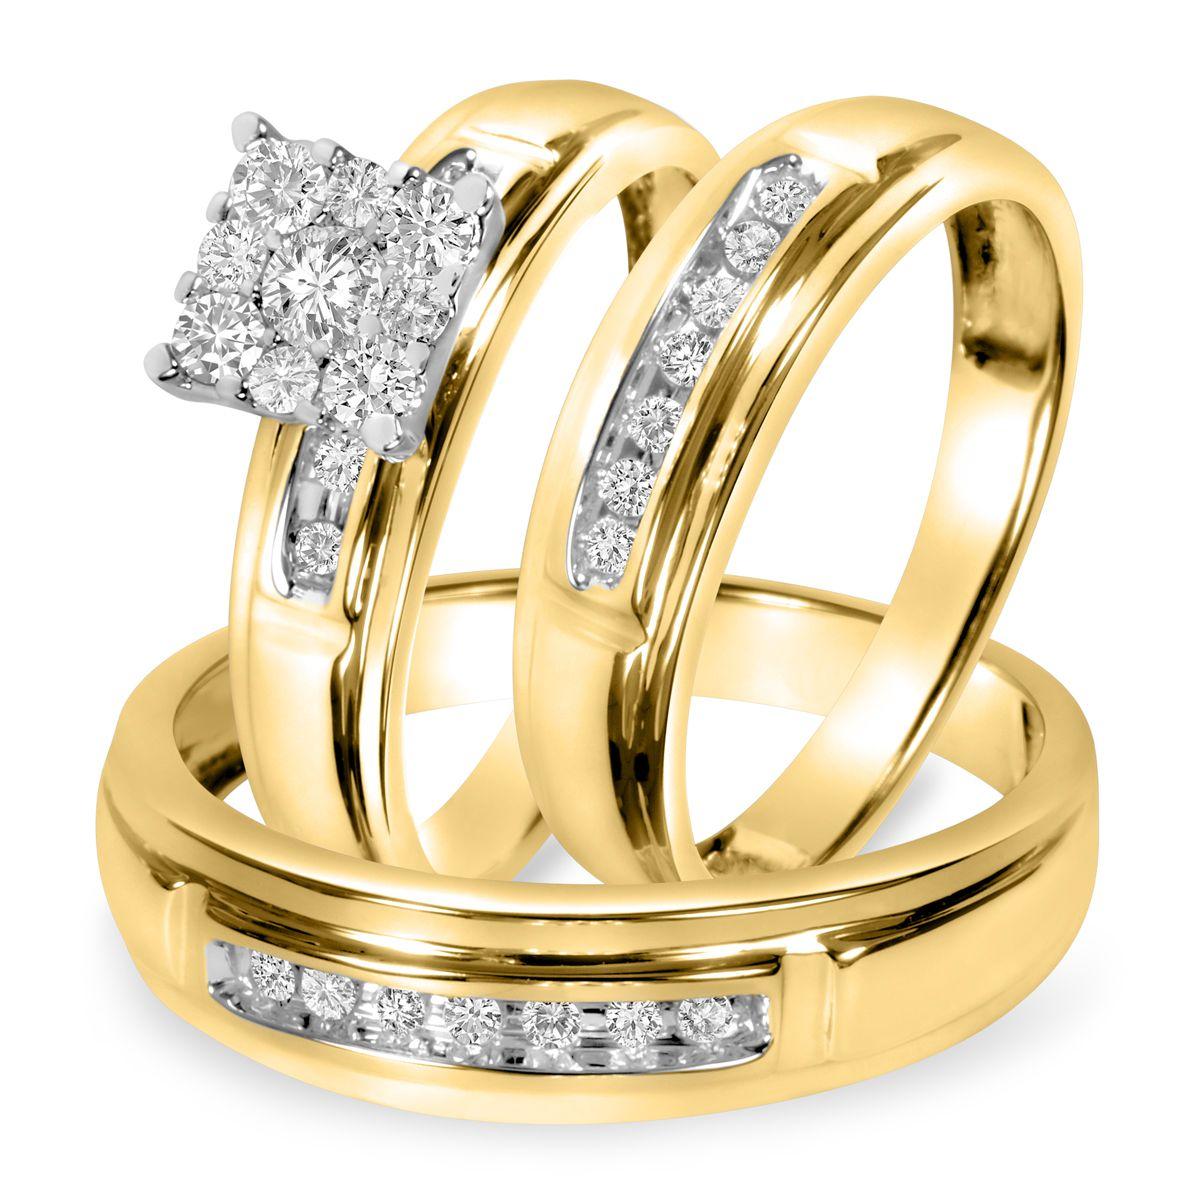 TW Diamond Trio Matching Wedding Ring Set 14K Yellow Gold